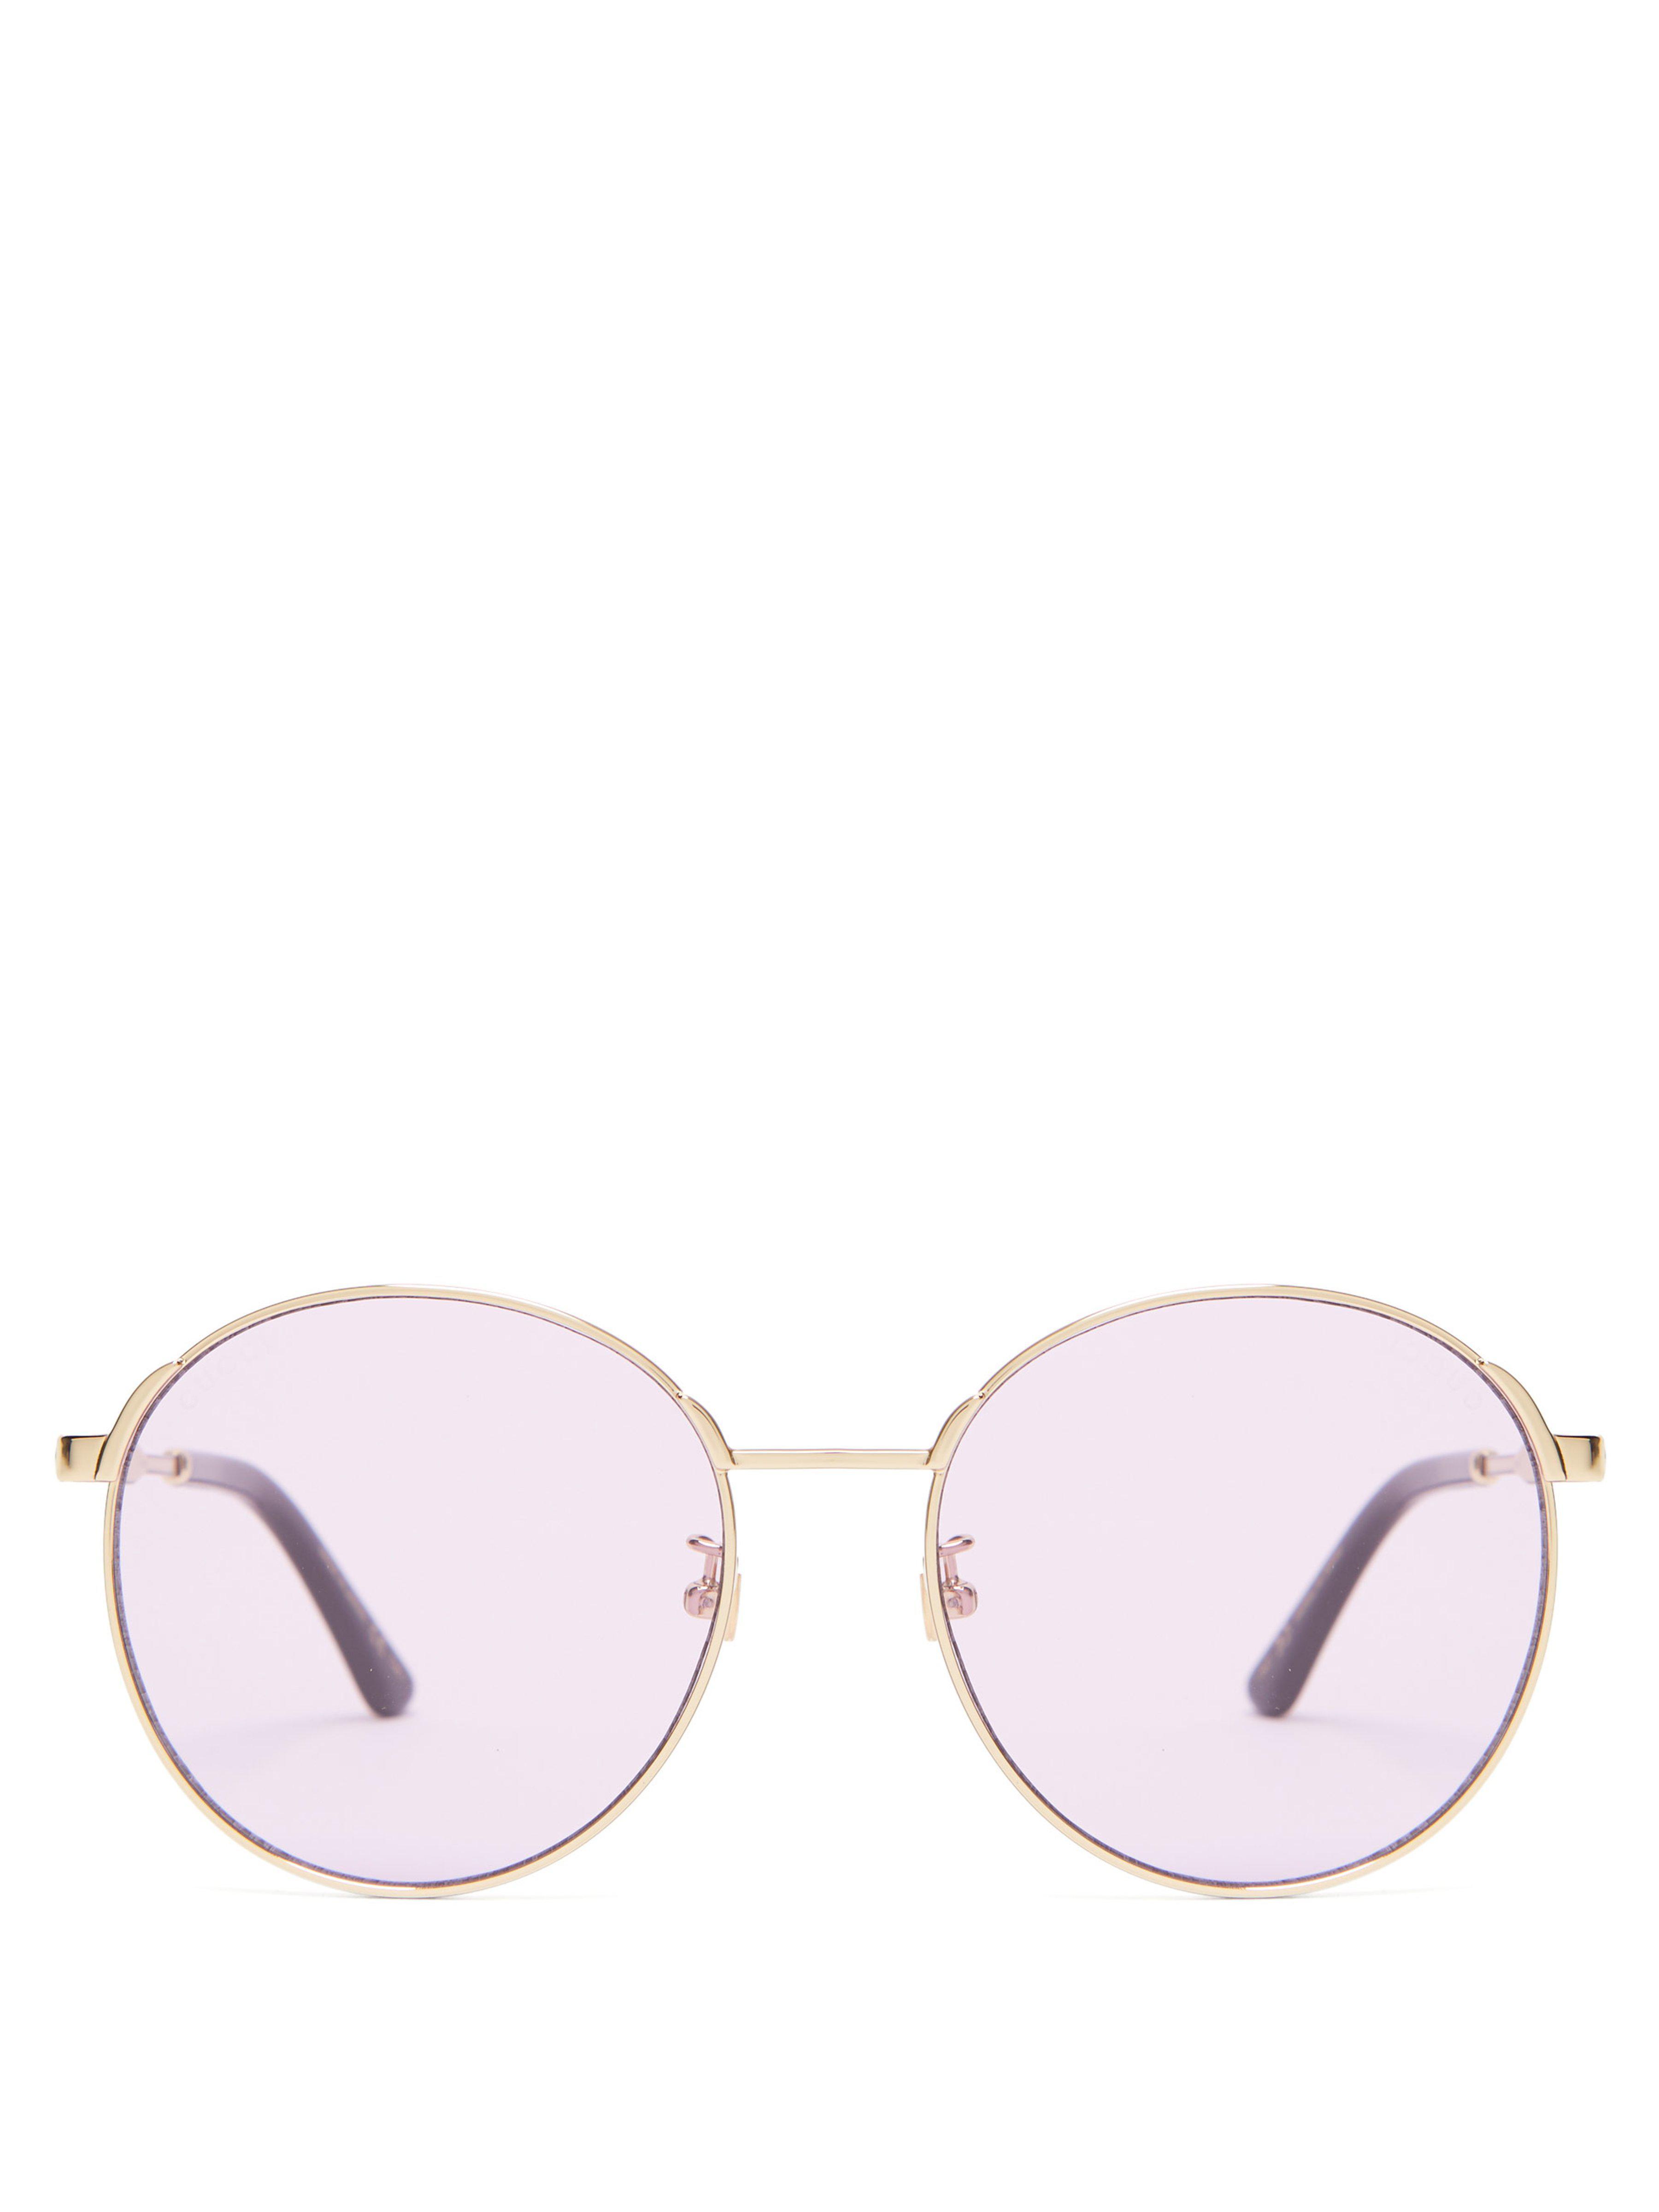 73db099ec30 Gucci. Women s Round Frame Metal Sunglasses